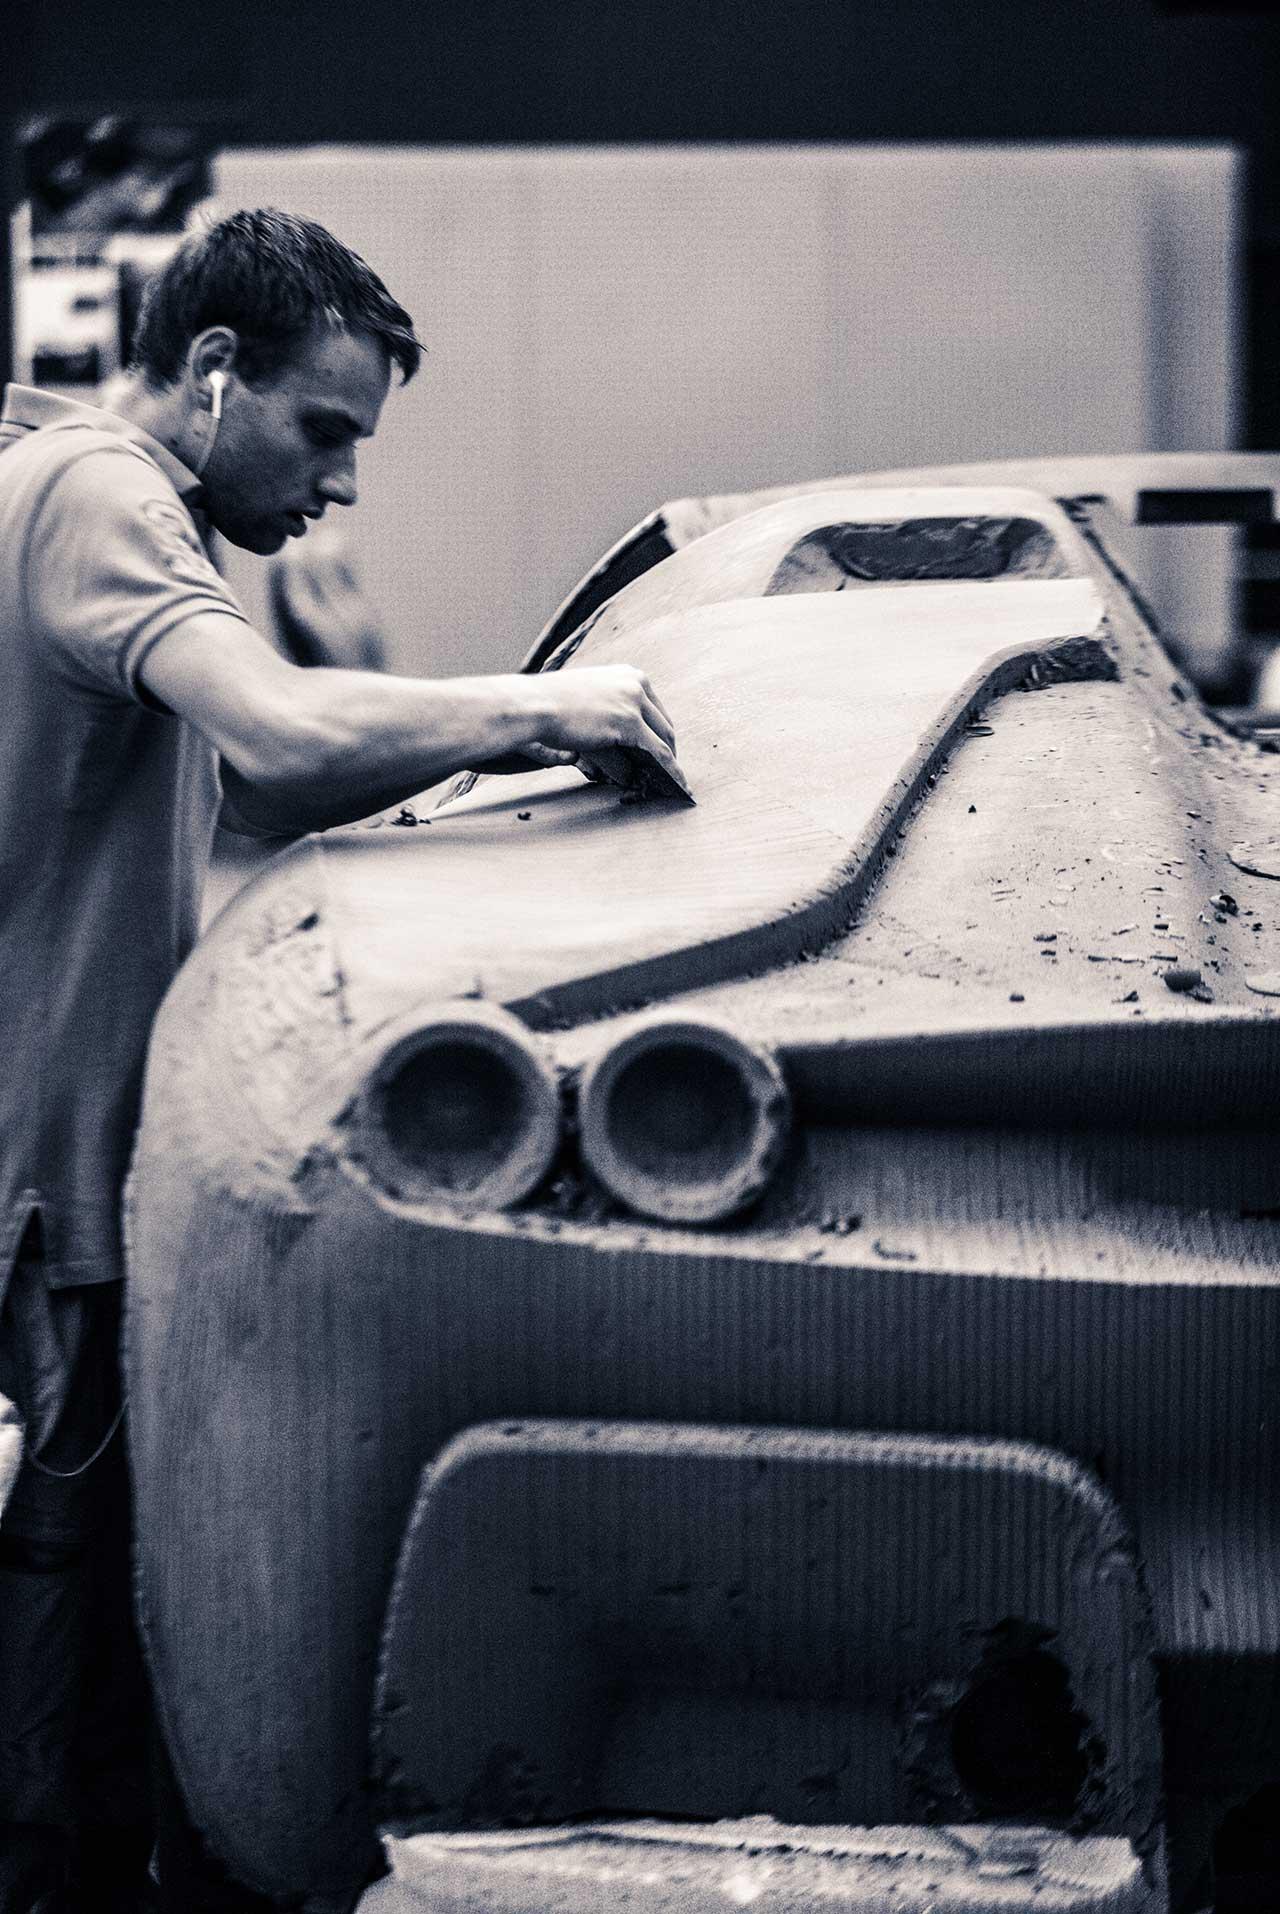 Crafting of clay design model of Ferrari J50.Photo courtesy of Ferrari.